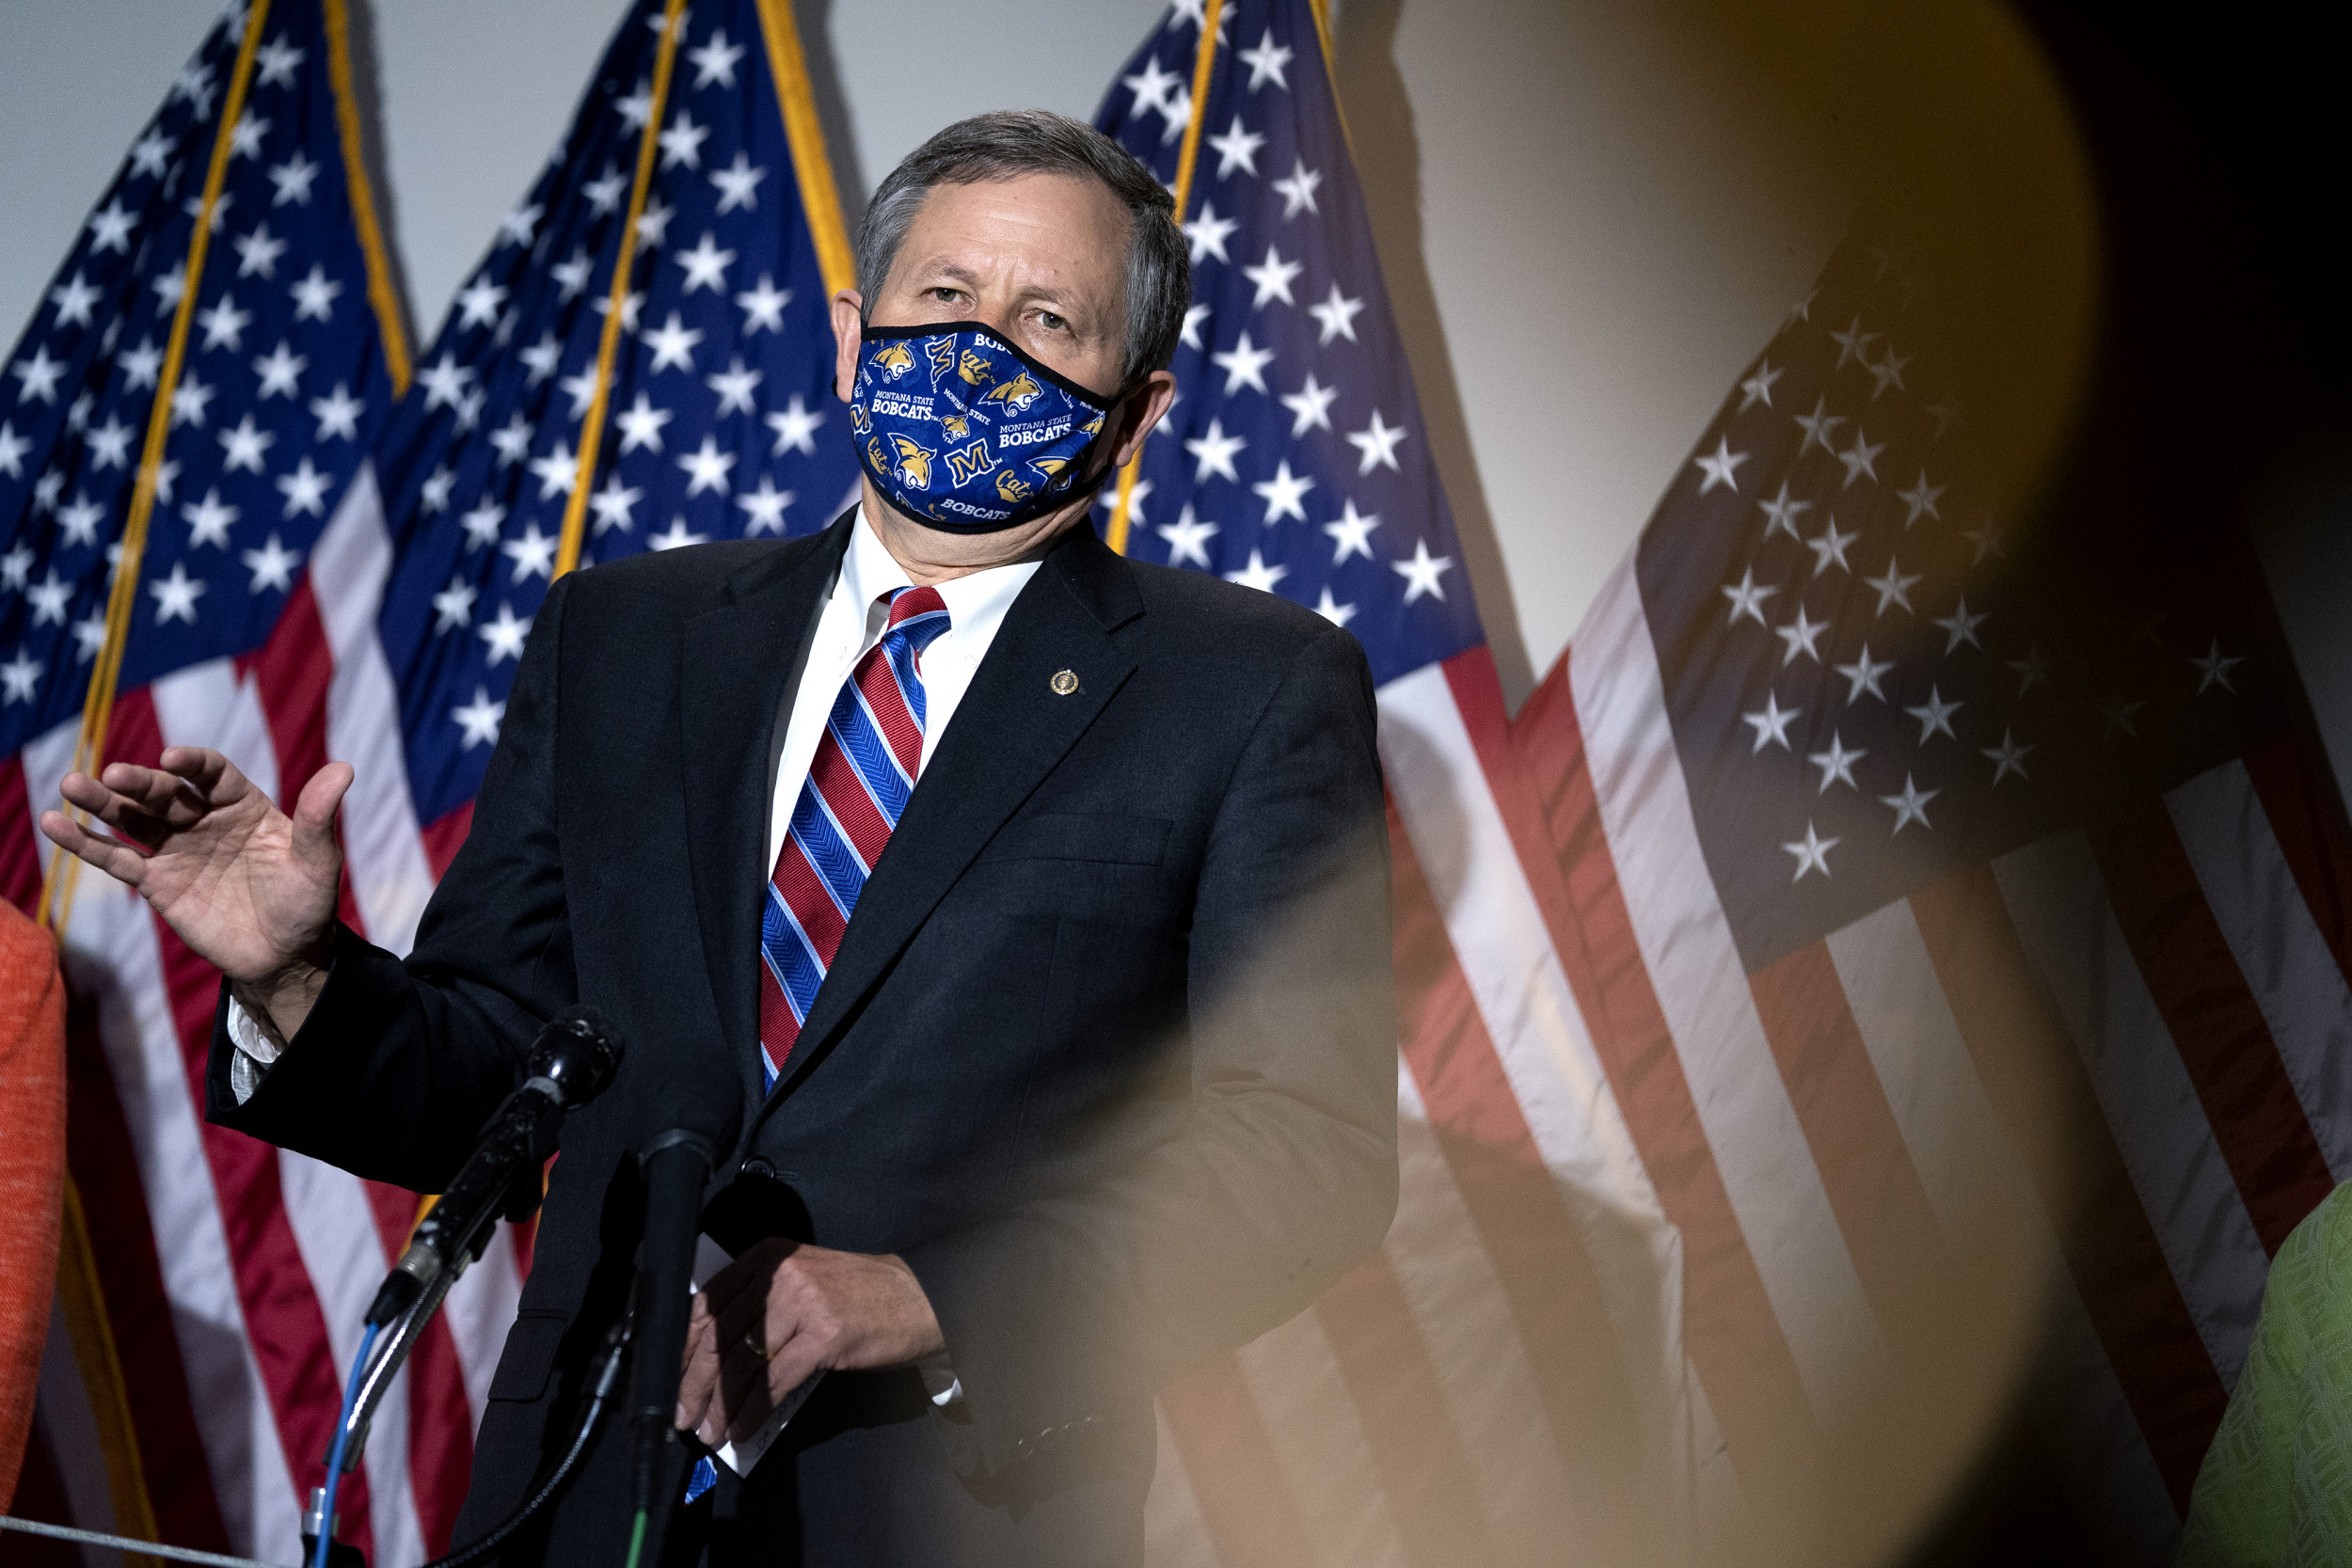 GOP Senator Steve Daines raked in cash from Big Pharma while backing drug-pricing bill